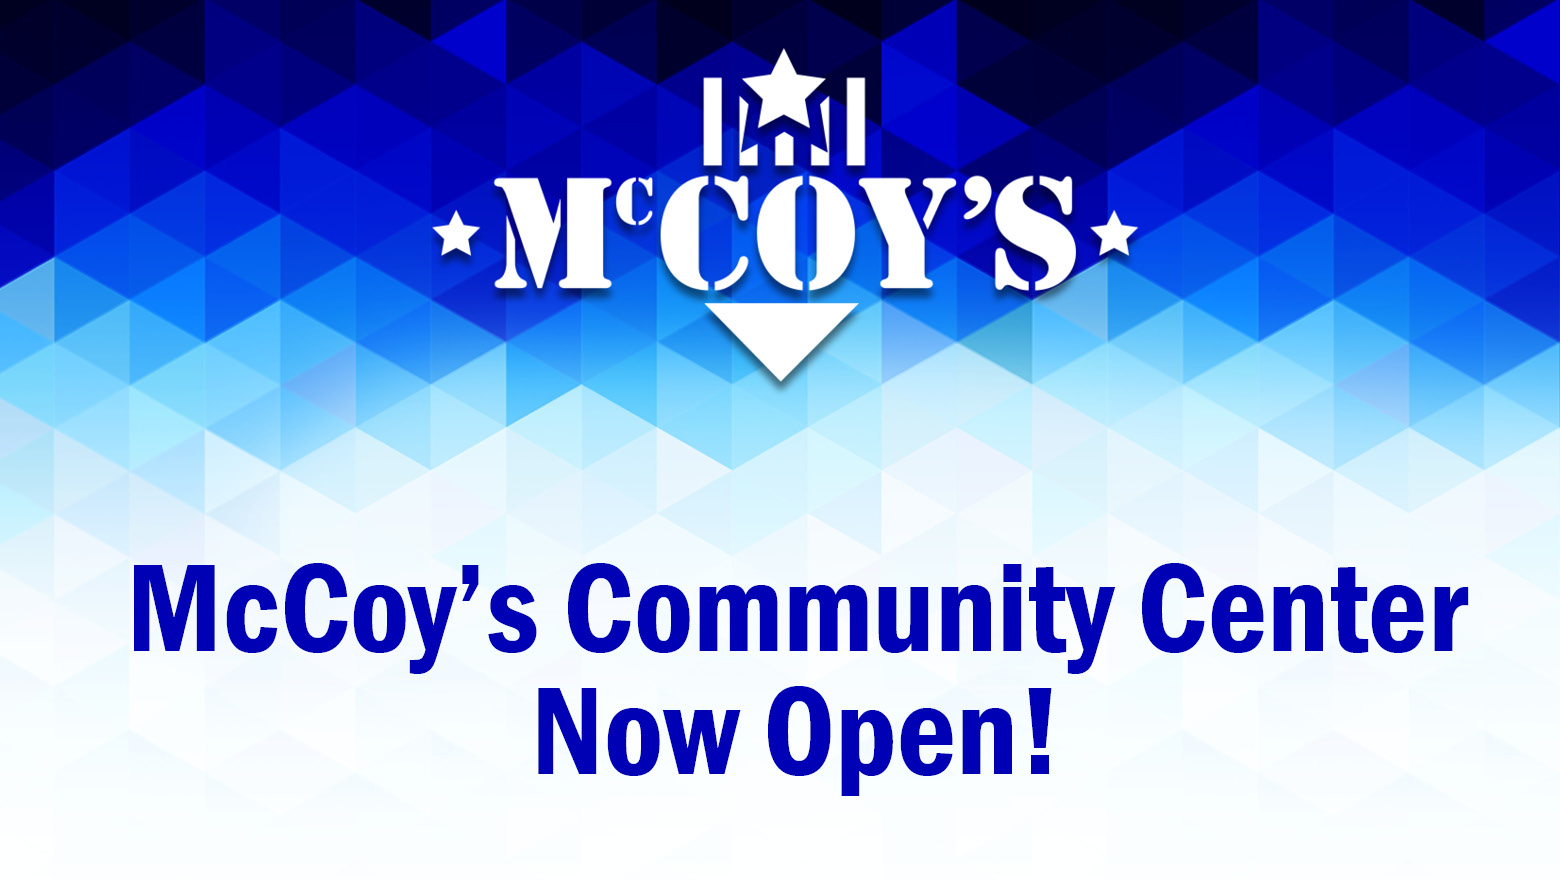 McCoy's Community Center - Now Open!